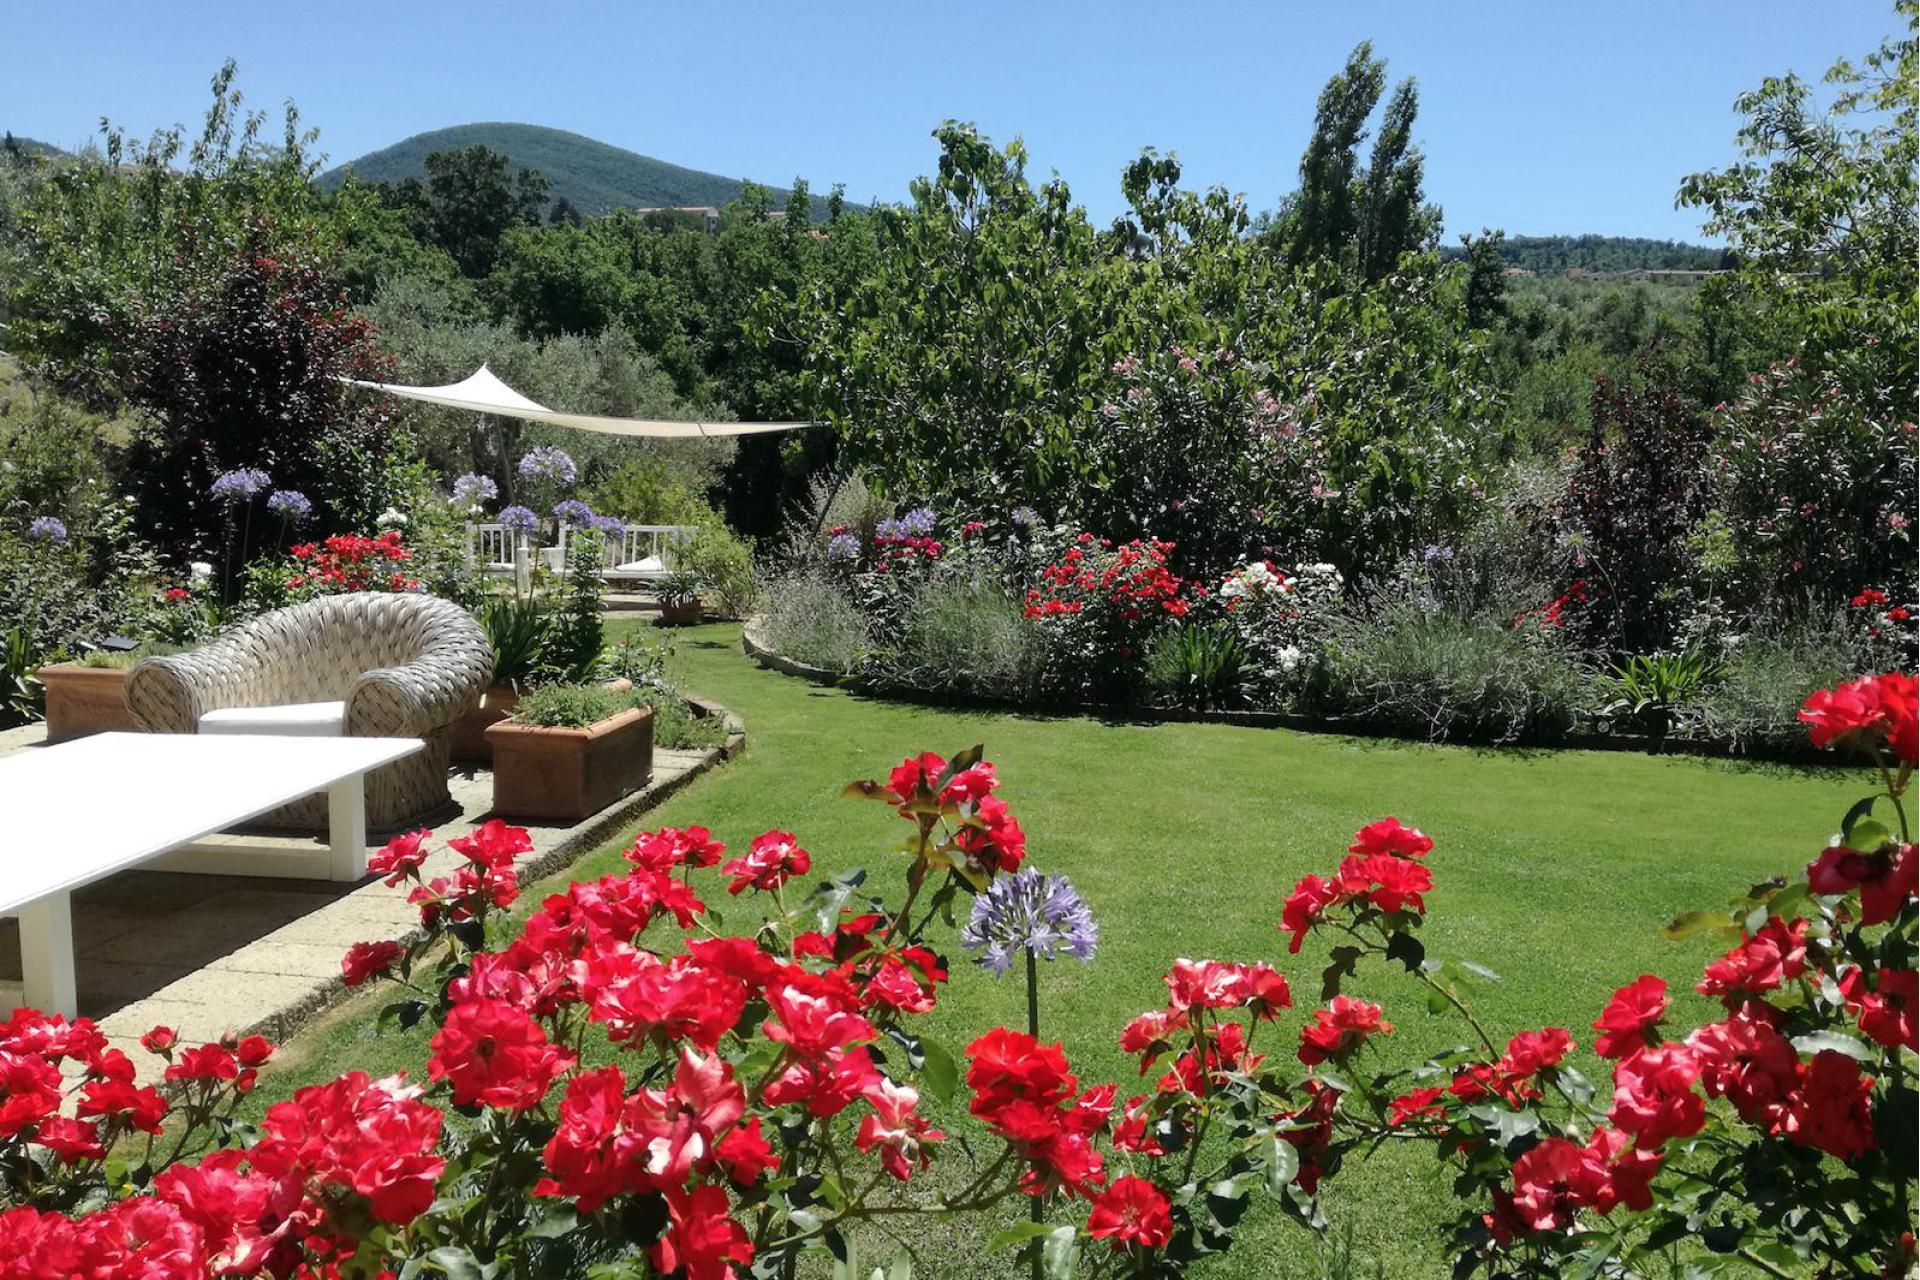 Agriturismo Toscane Agriturismo in olijfgaard met super uitzicht in Toscane